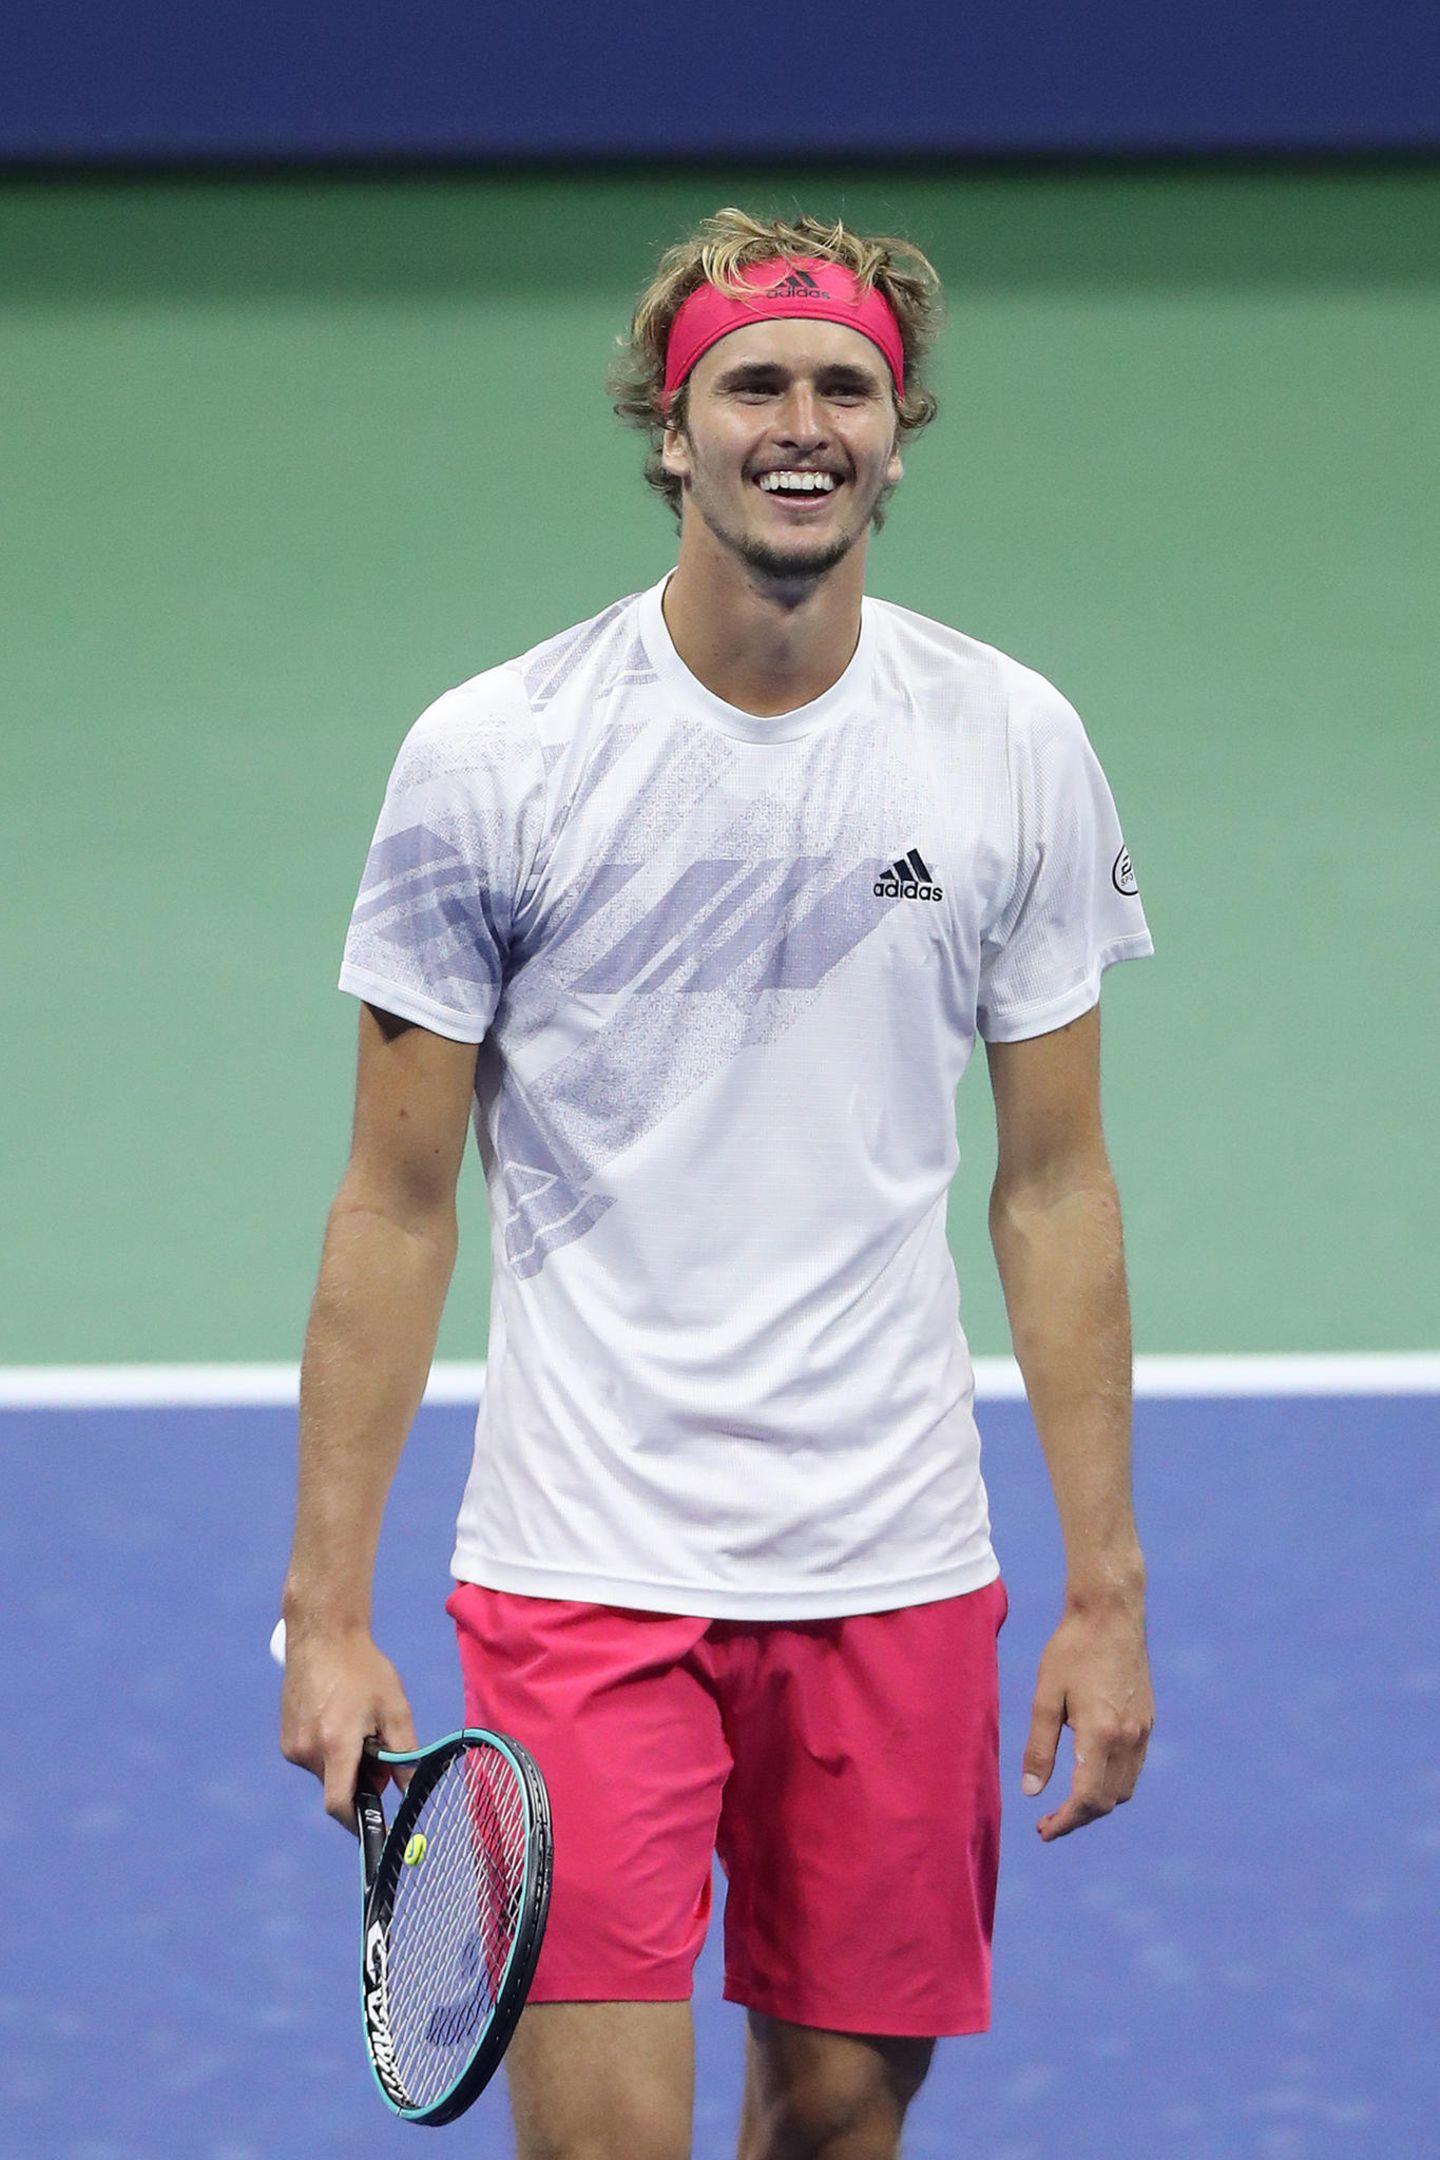 Alexander Zverev Dominic Thiem Co Die Welt Der Jungen Tennisstars Gala De